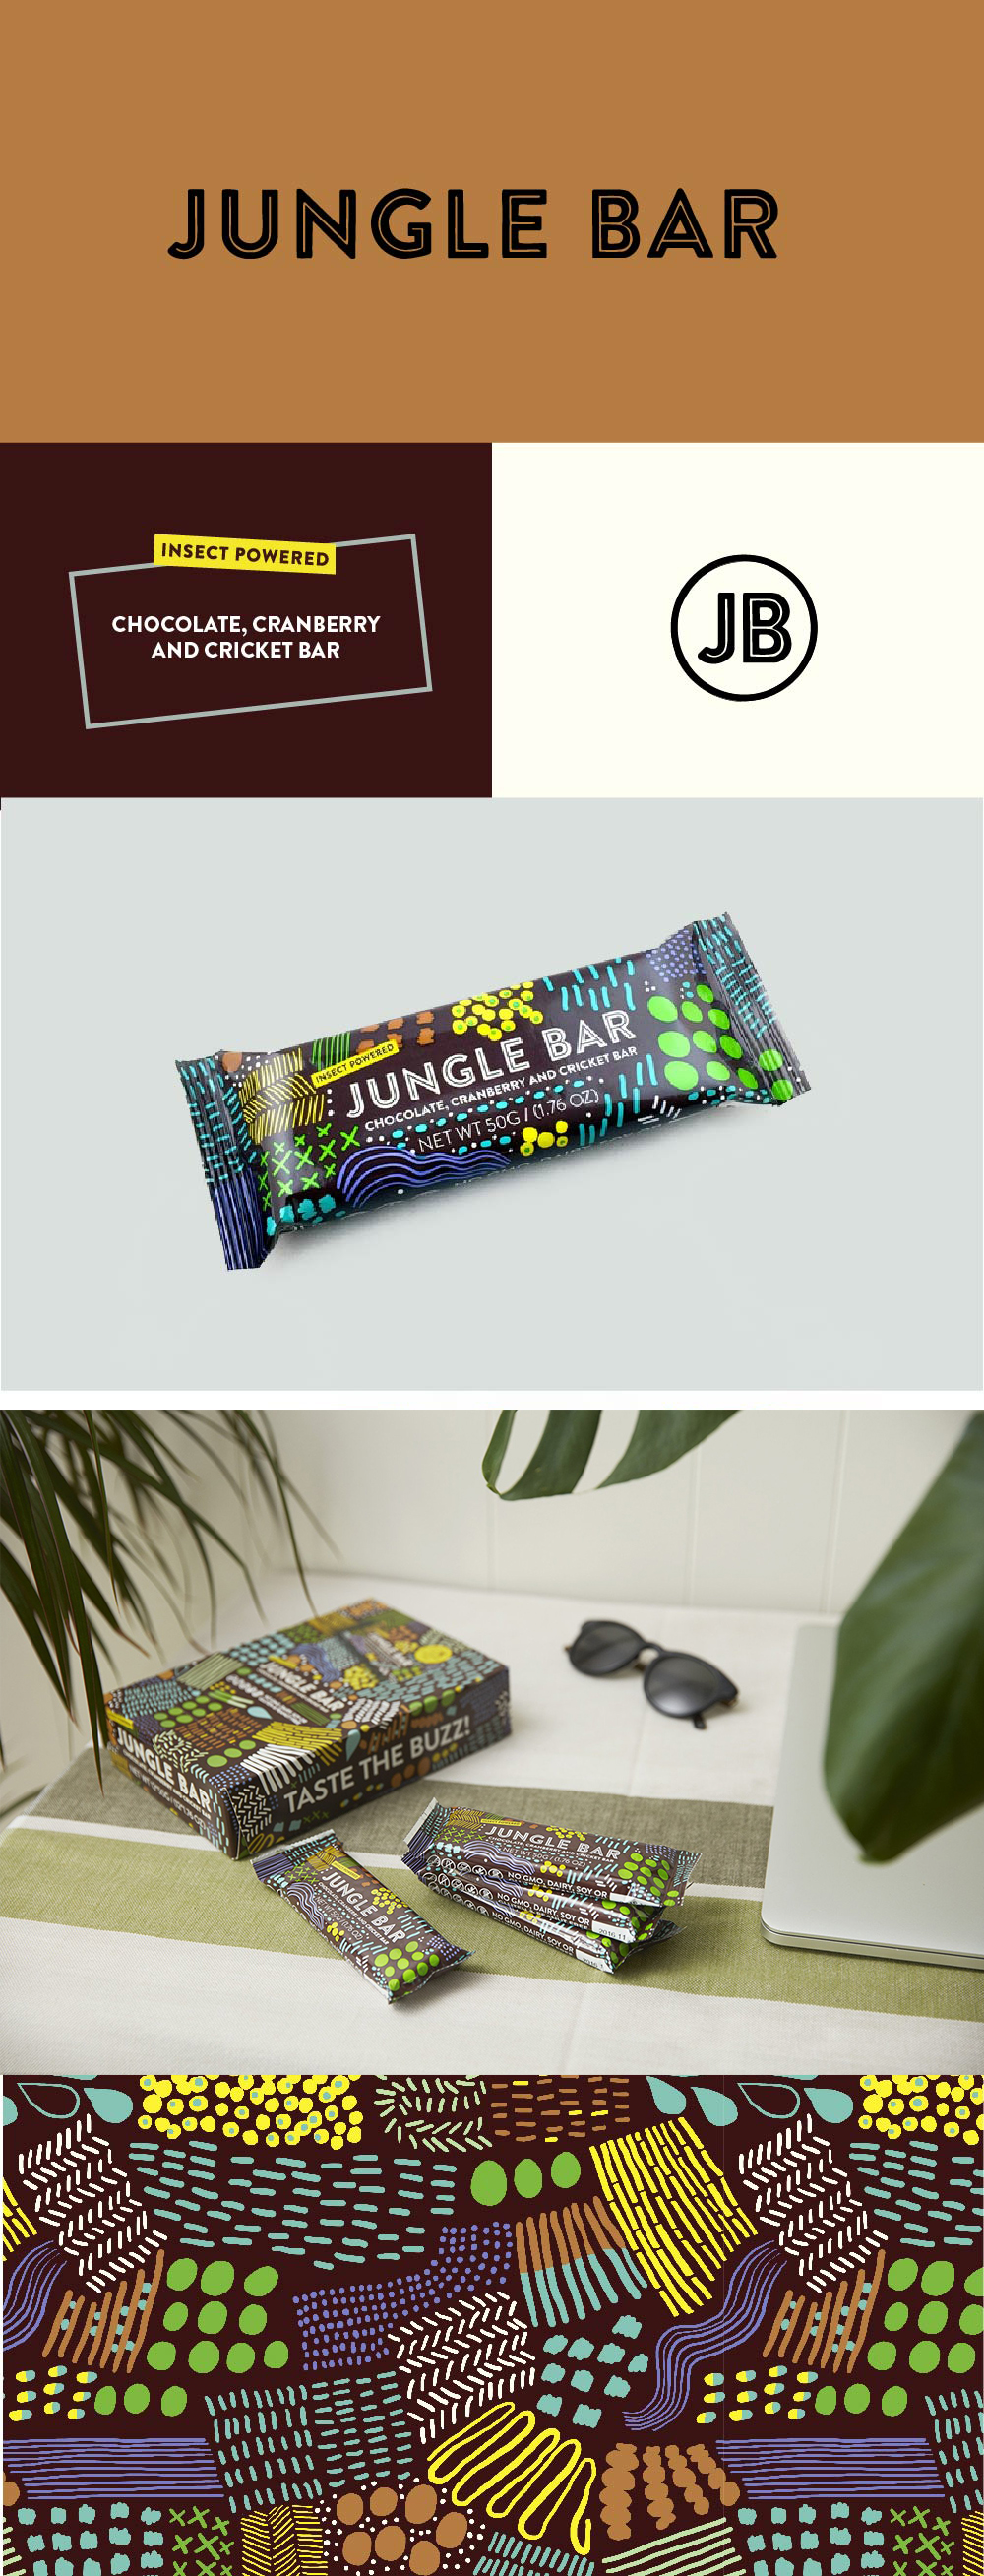 Jungle+Bar+&+brand+identity+|+tomasdottir.+|+logo+design,+pattern+design,+sustainable+design,+branding,+bold,+fun,+friendly+pattern